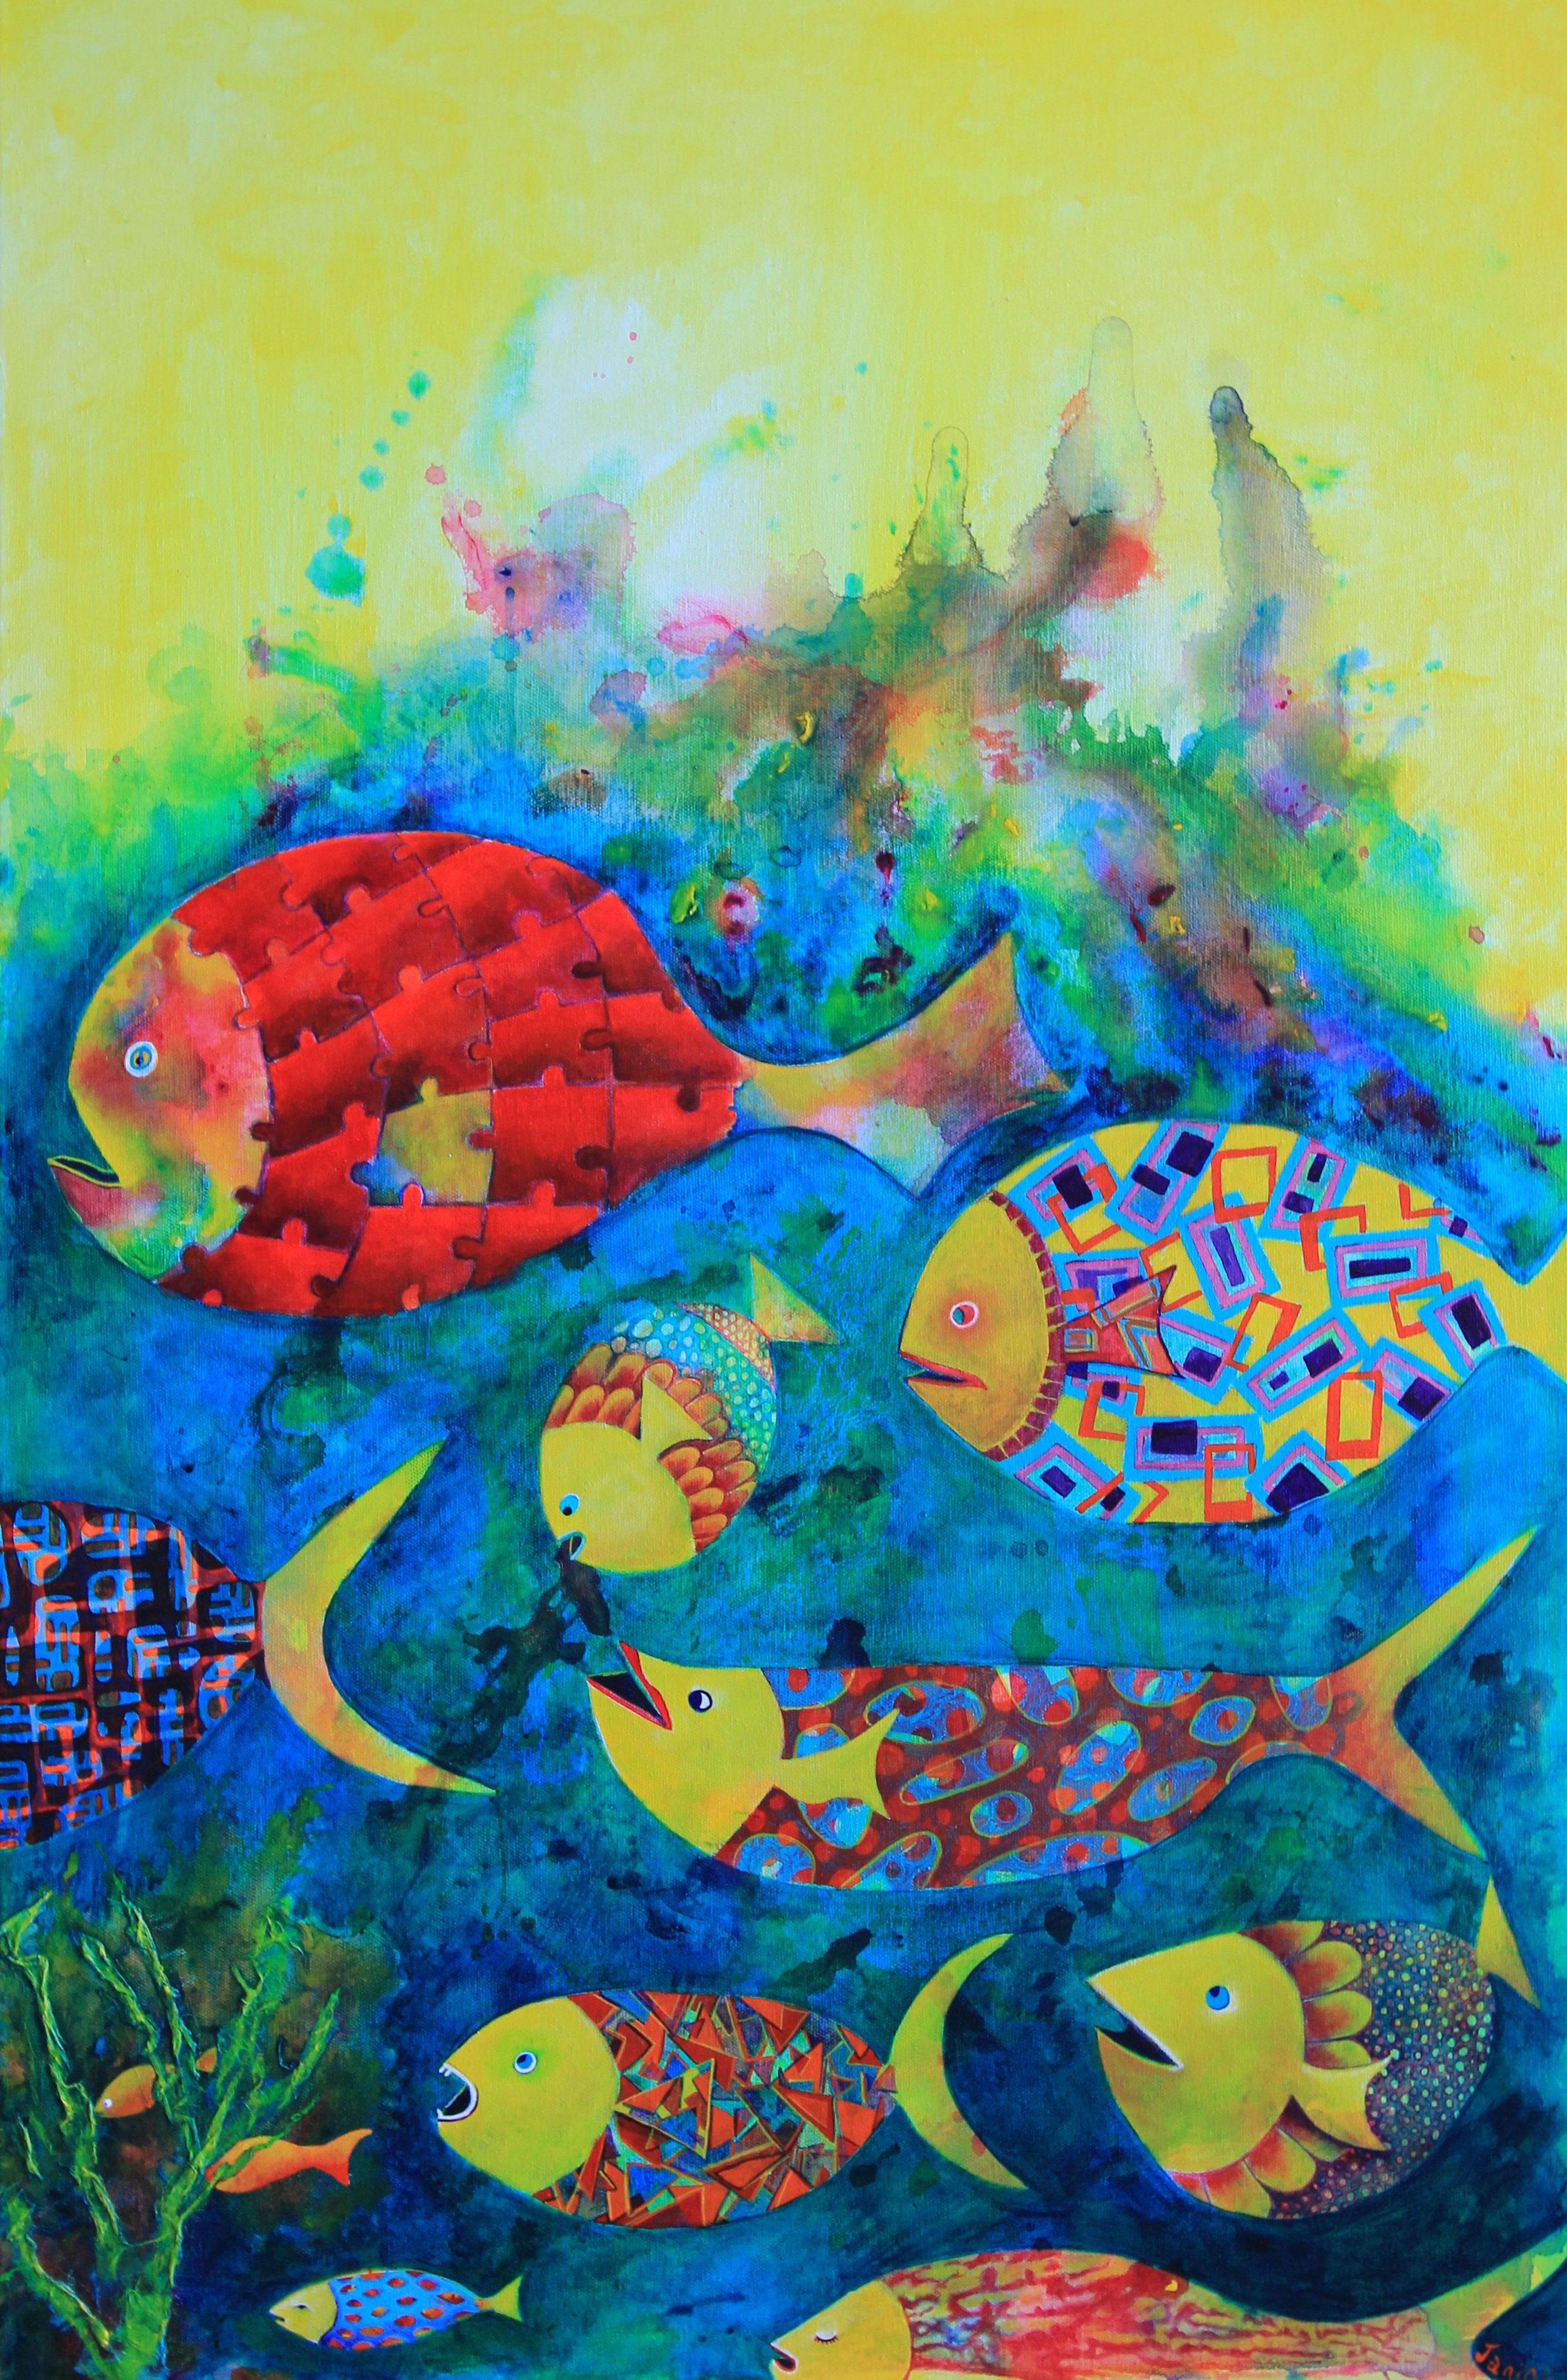 janine gasbarri.splash.2018.acrylic on canvas.jpg